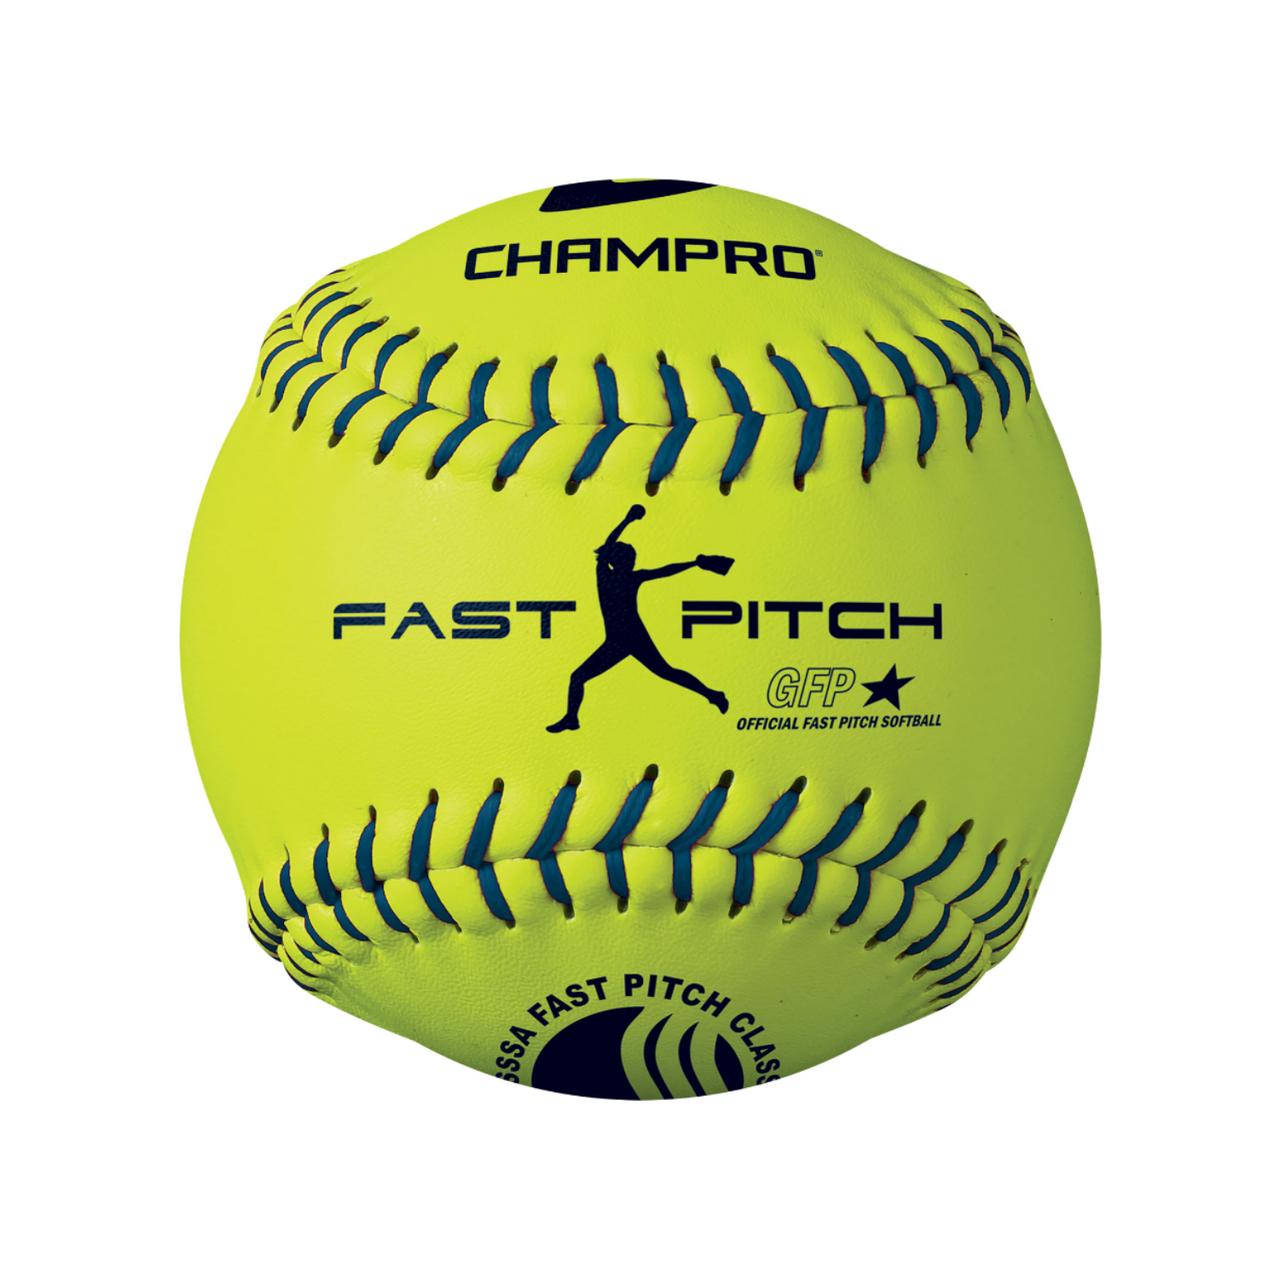 Fastpitch Softballs